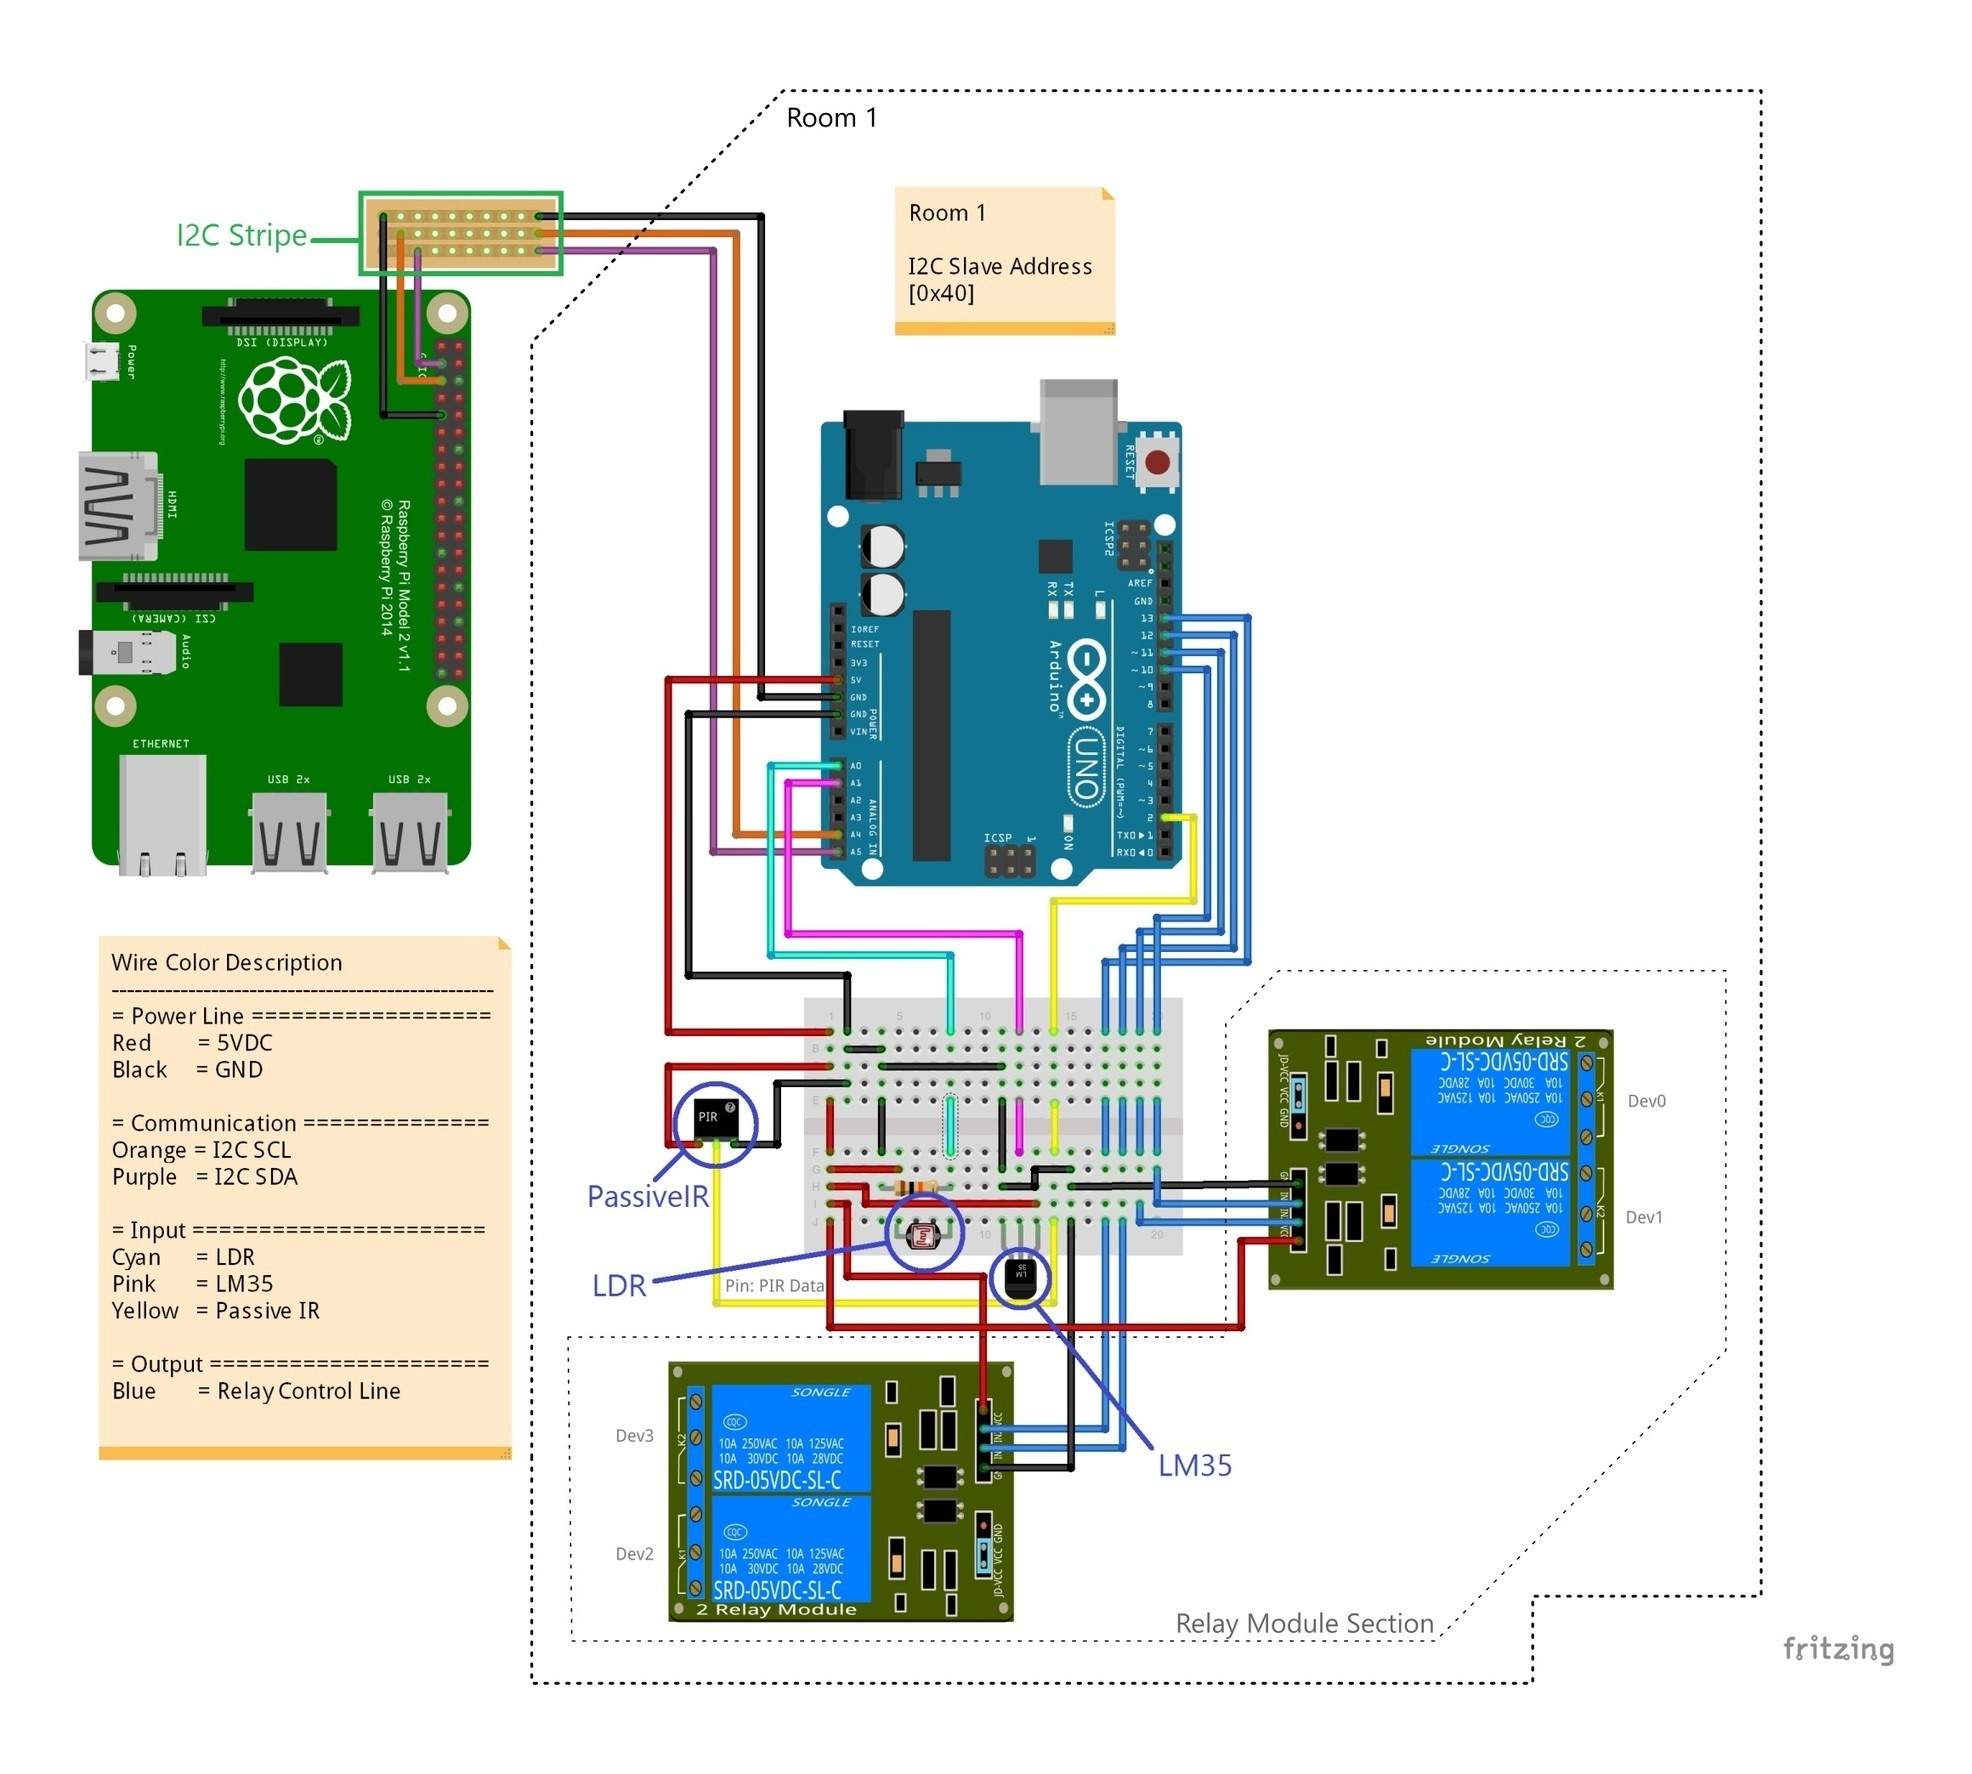 5kTy23URNO_liLz3ZjmB14XXXL4j3HpexhjNOf_P3YmryPKwJ94QGRtDb3Sbc6KY home automation using raspberry pi 2 and window yun ba wiring diagram at et-consult.org